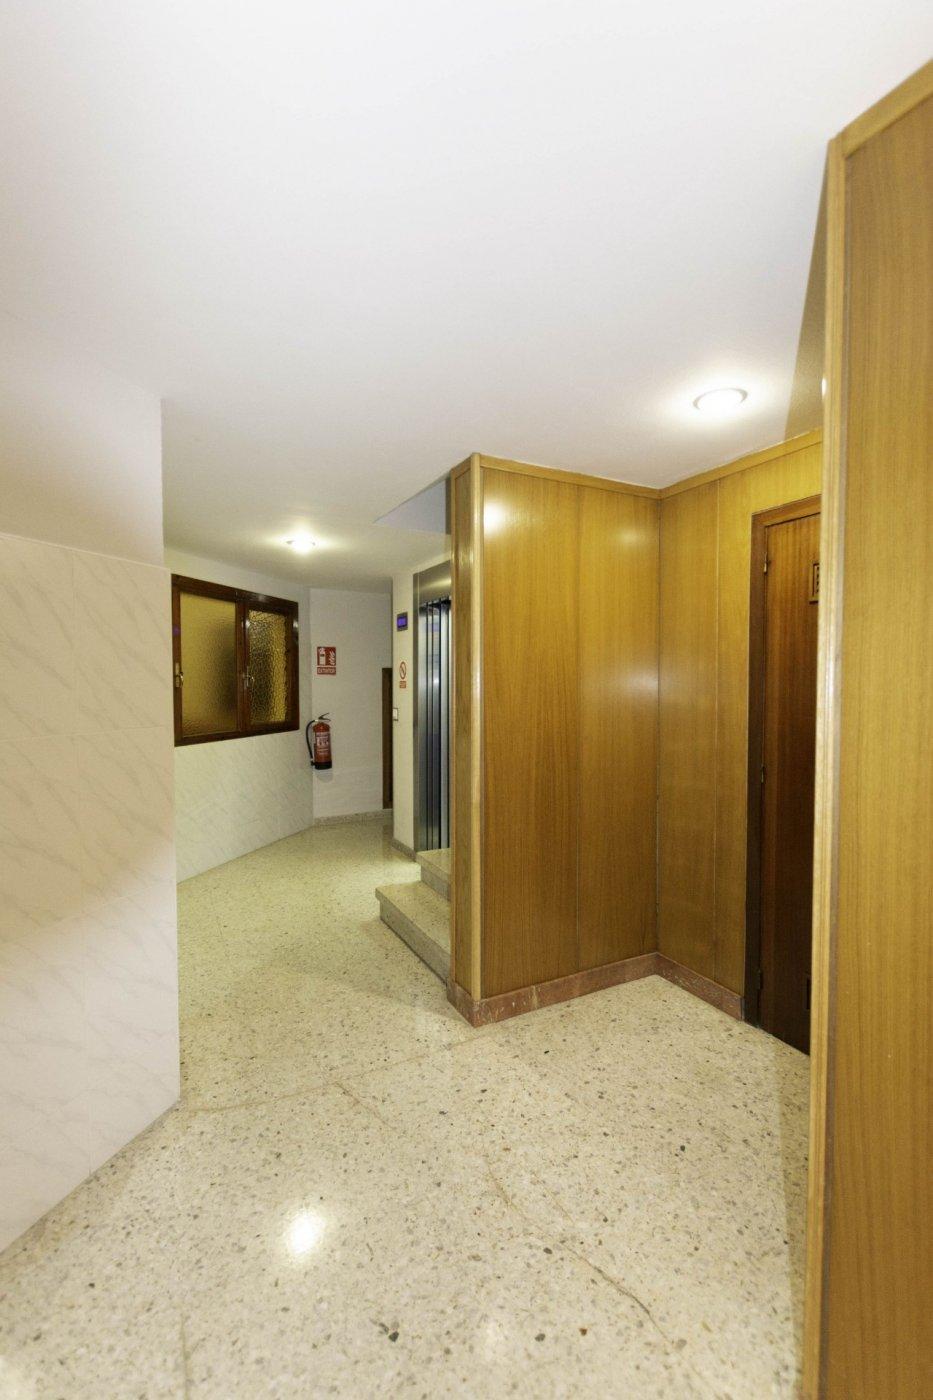 Apartamento en vallobin - imagenInmueble14